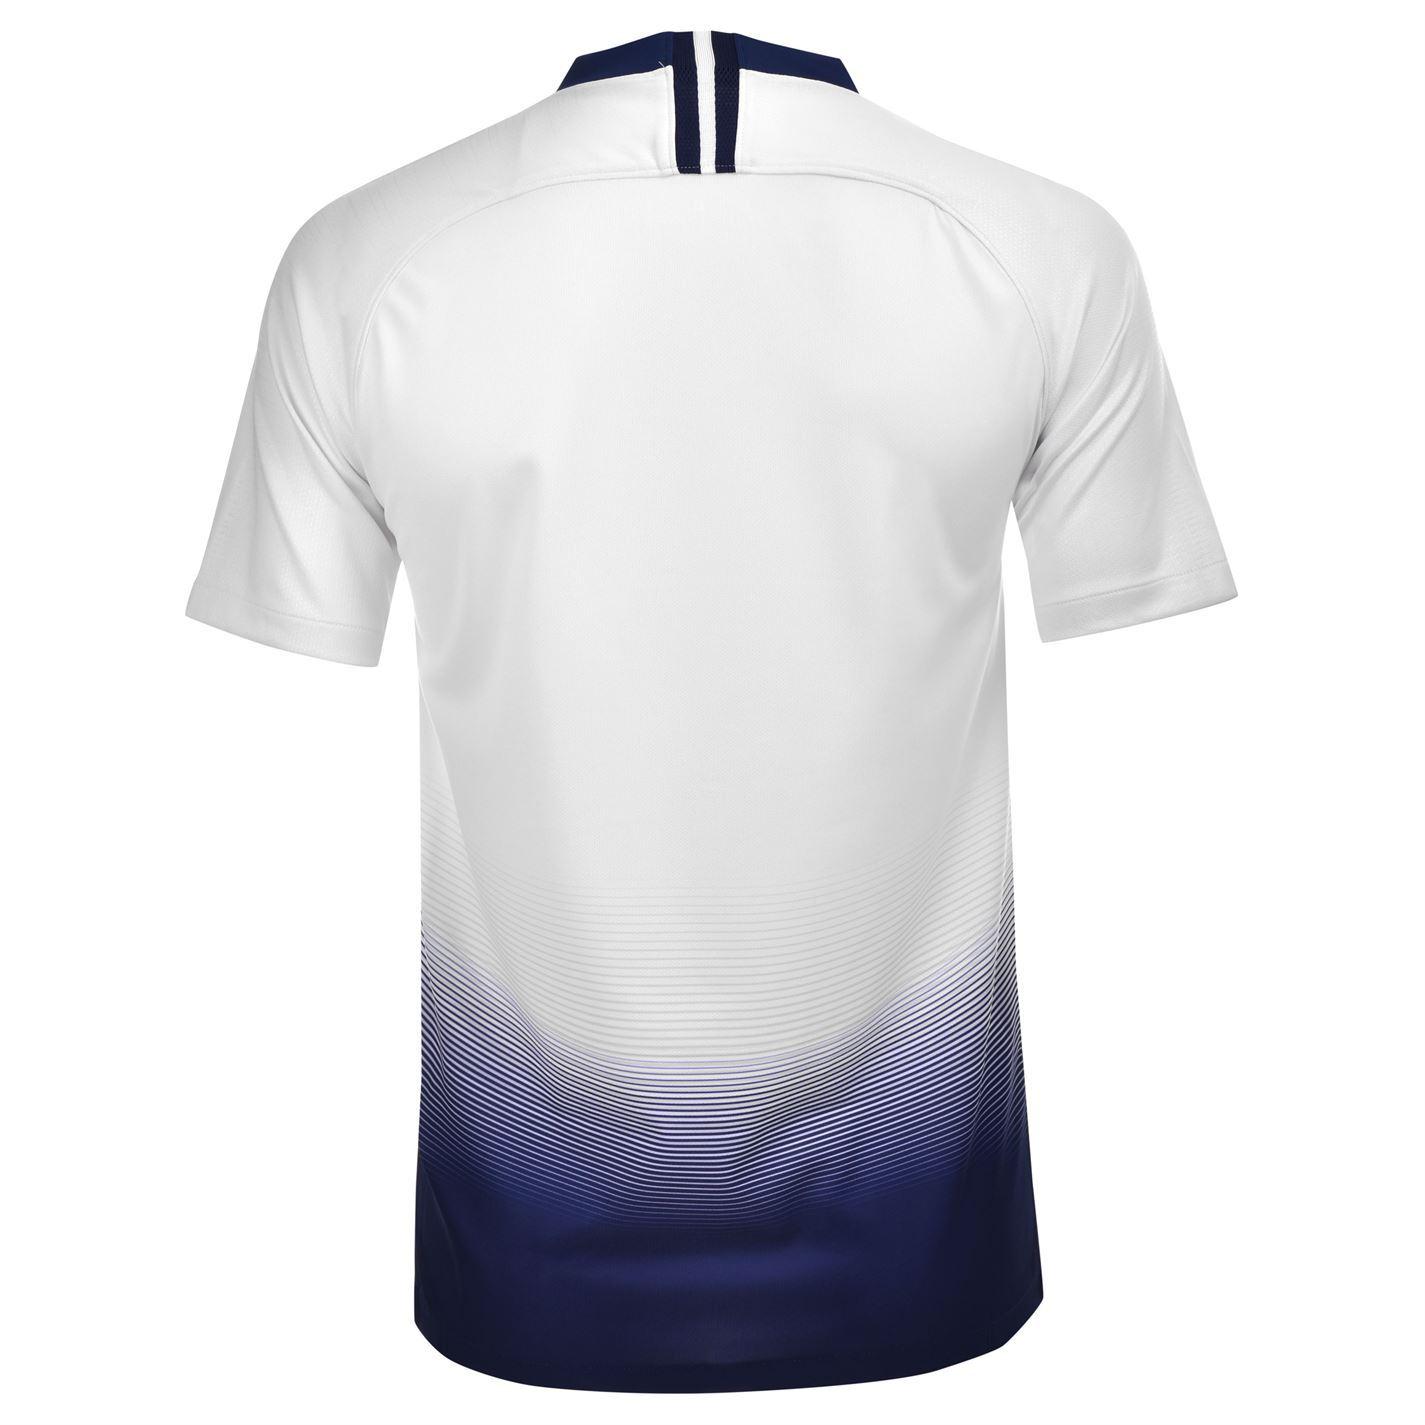 7fd1ab0526f5 Nike Tottenham Hotspur Home Jersey 2018 2019 Mens White Football Soccer  Shirt